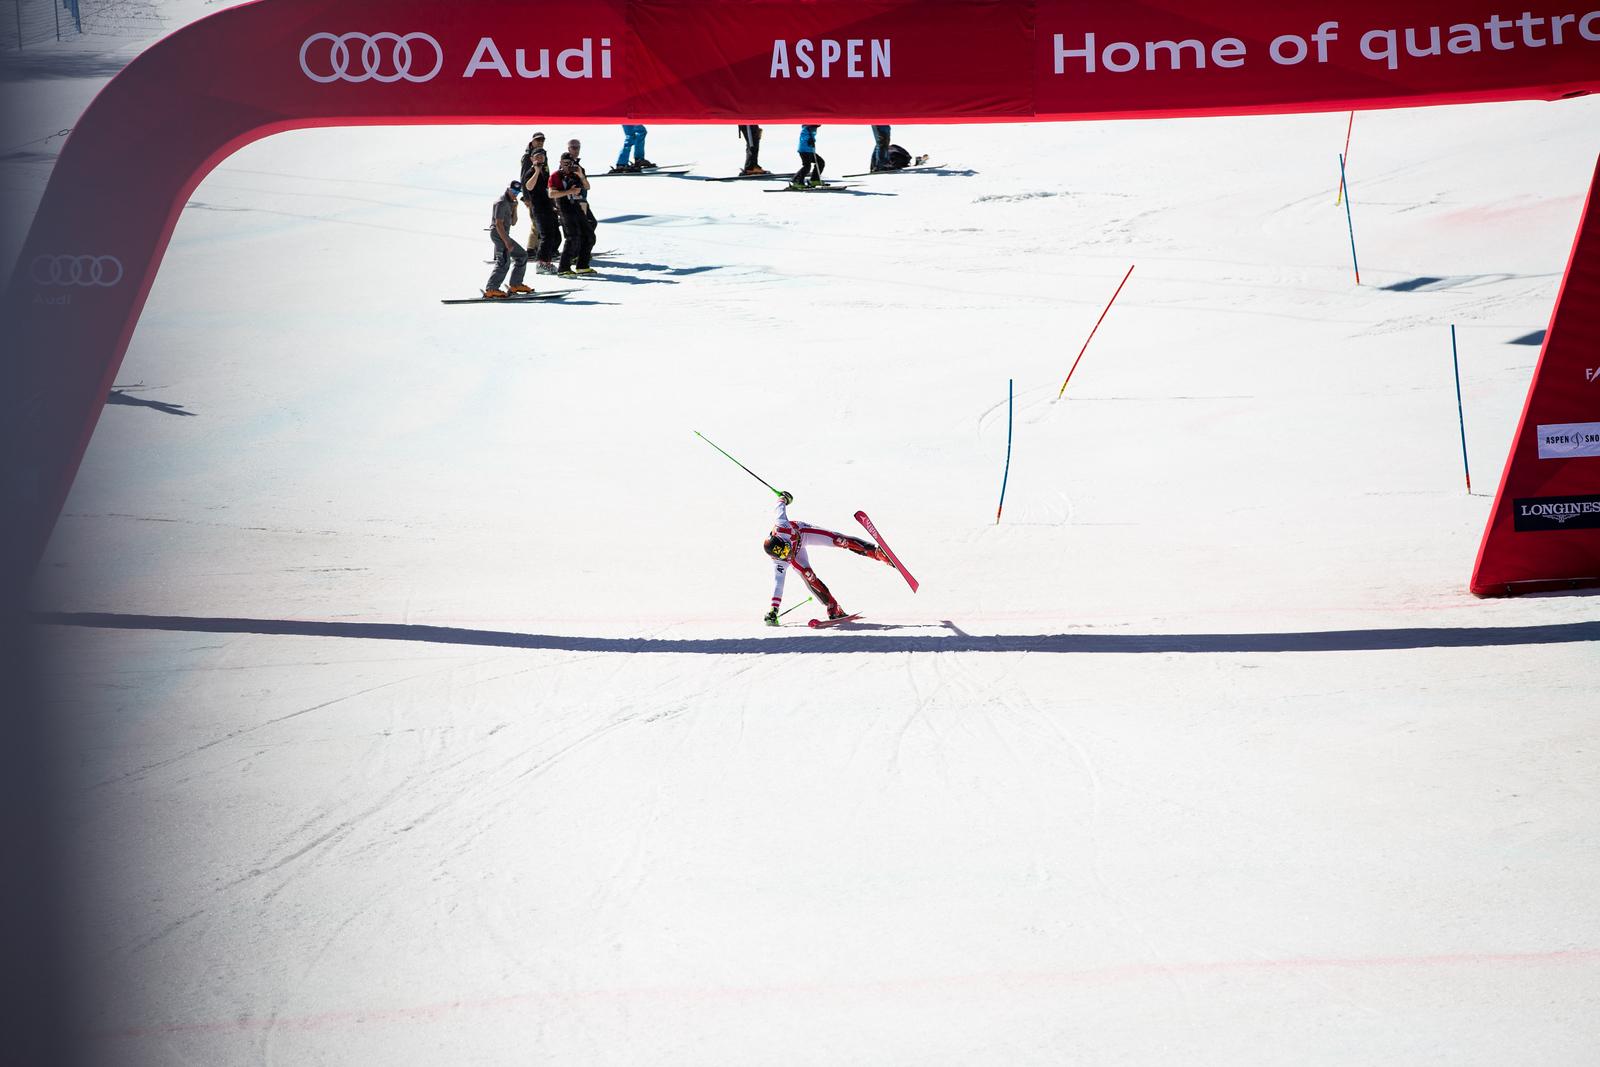 Marcel Hirscher Slalom 2017 Audi FIS Ski World Cup finals in Aspen, CO. Photo: U.S. Ski Team